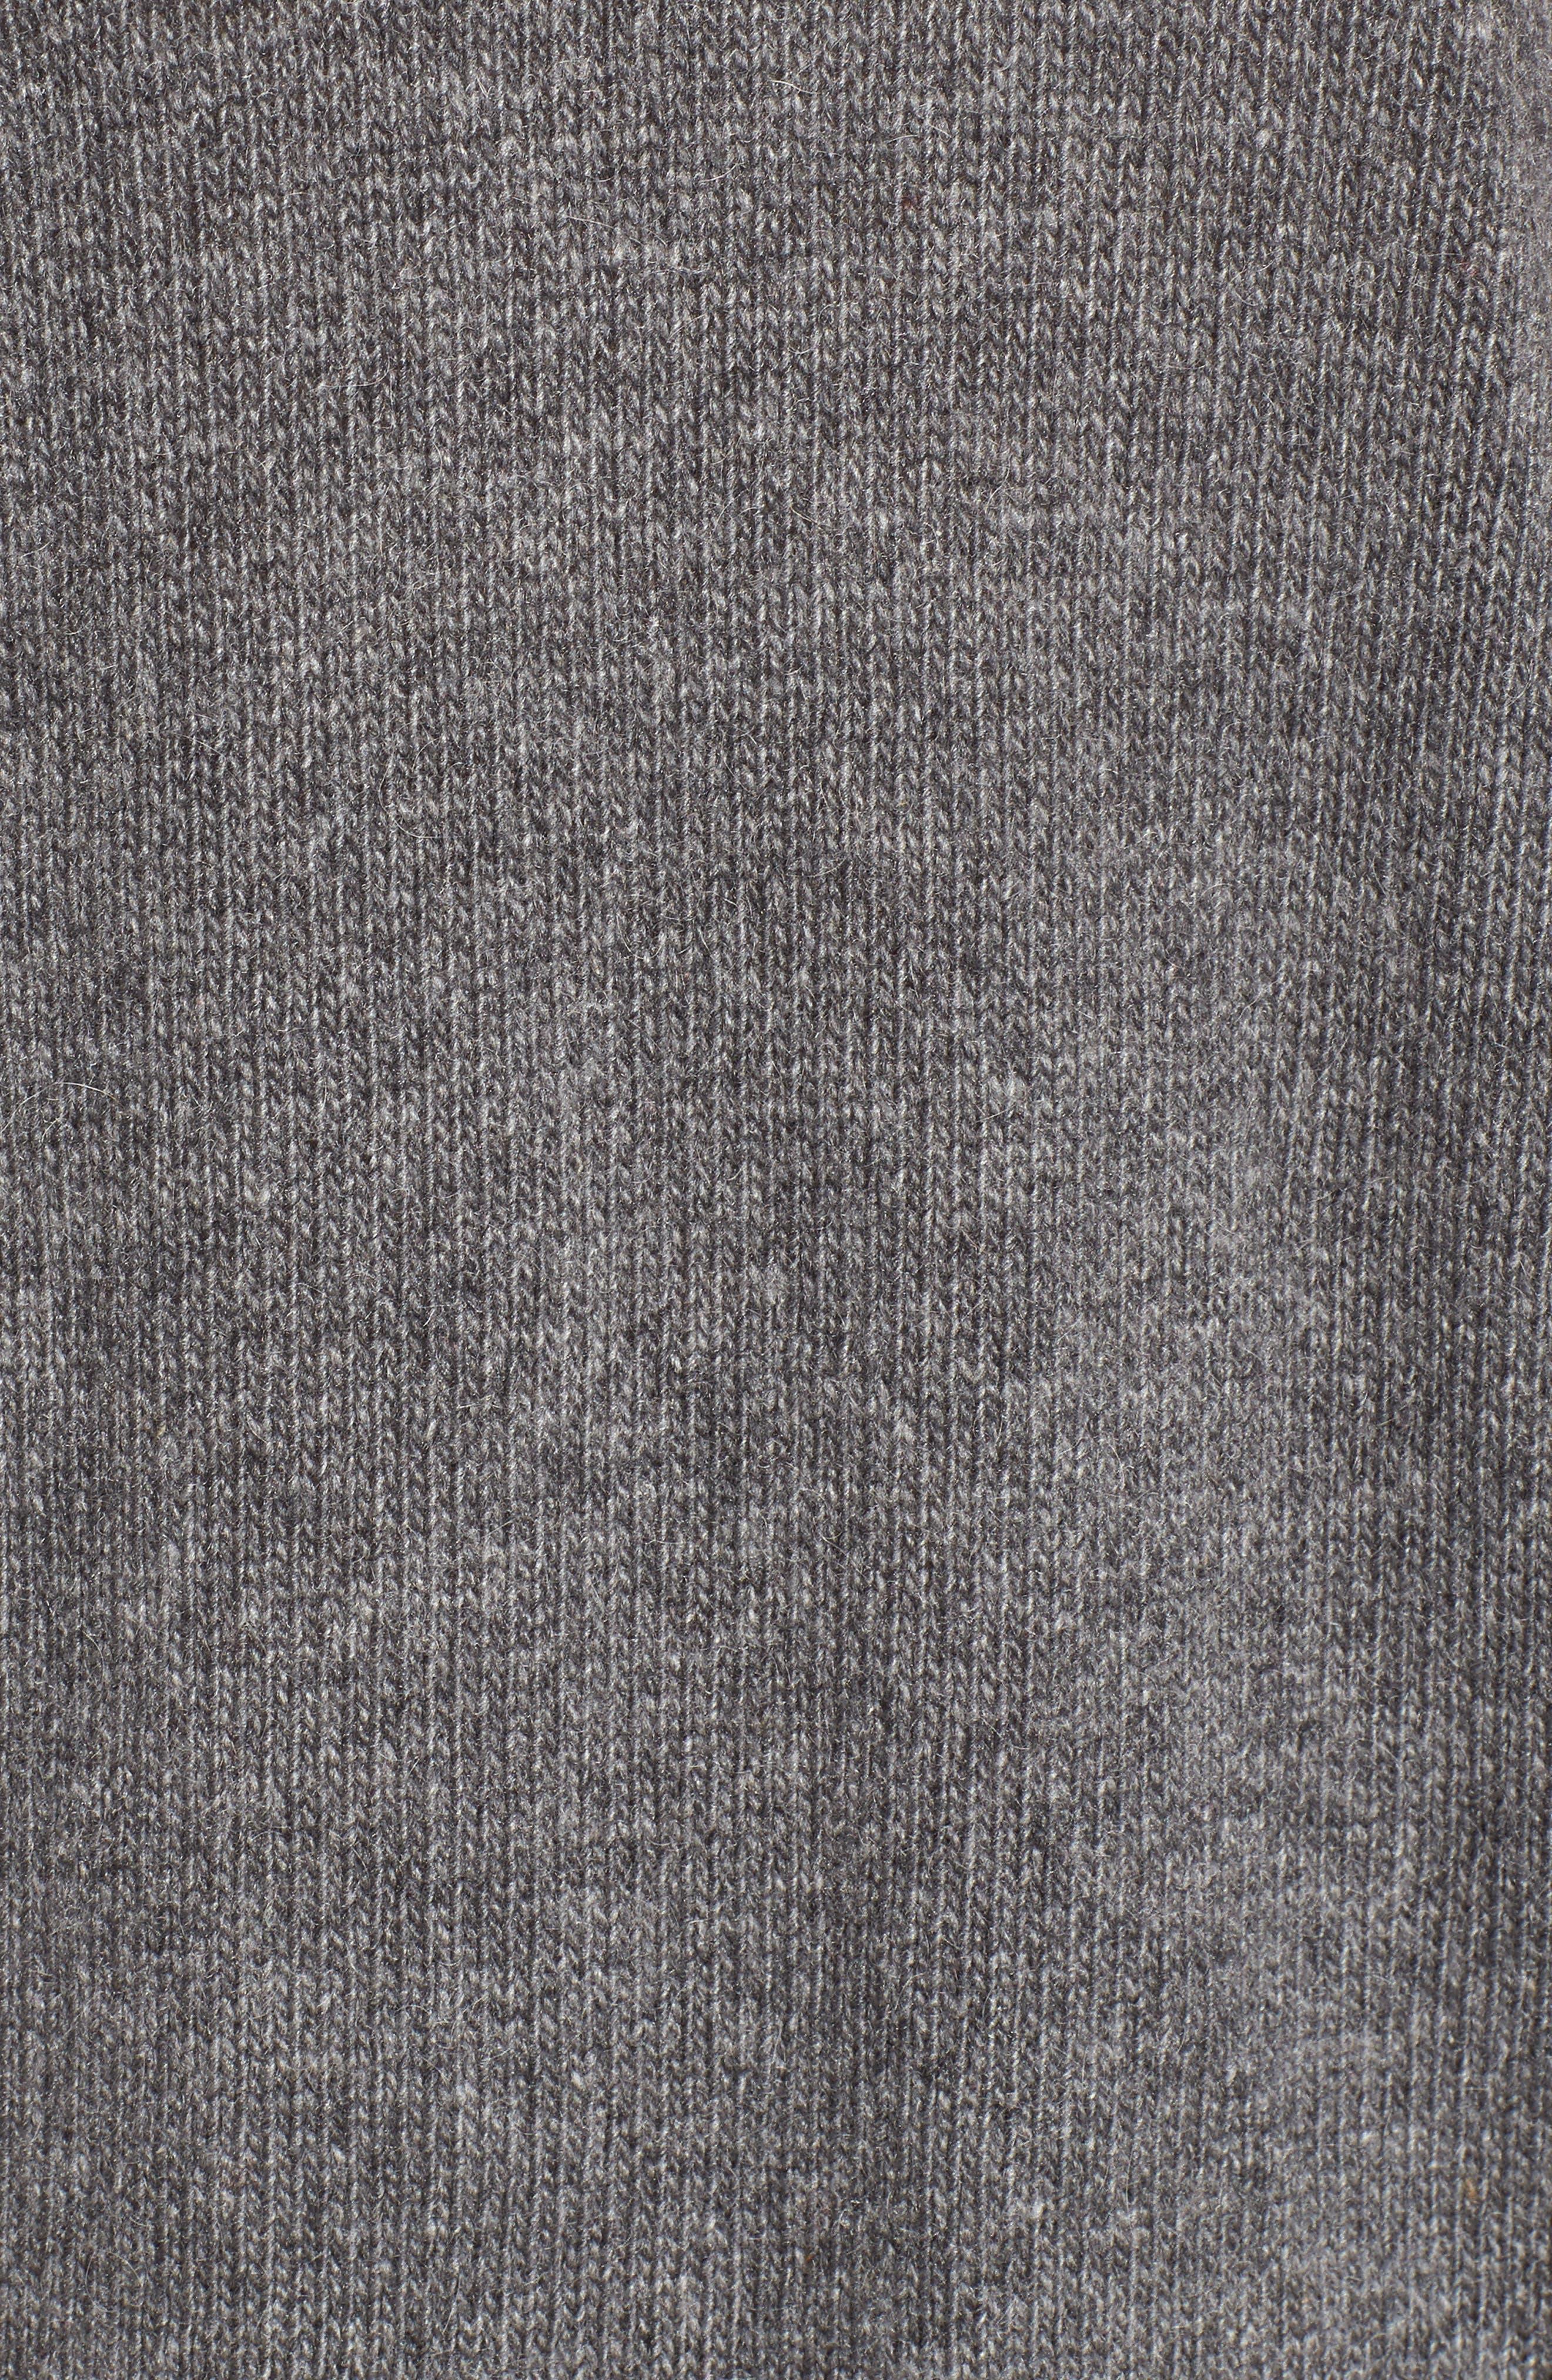 Lace-Up Cold Shoulder Minidress,                             Alternate thumbnail 5, color,                             030